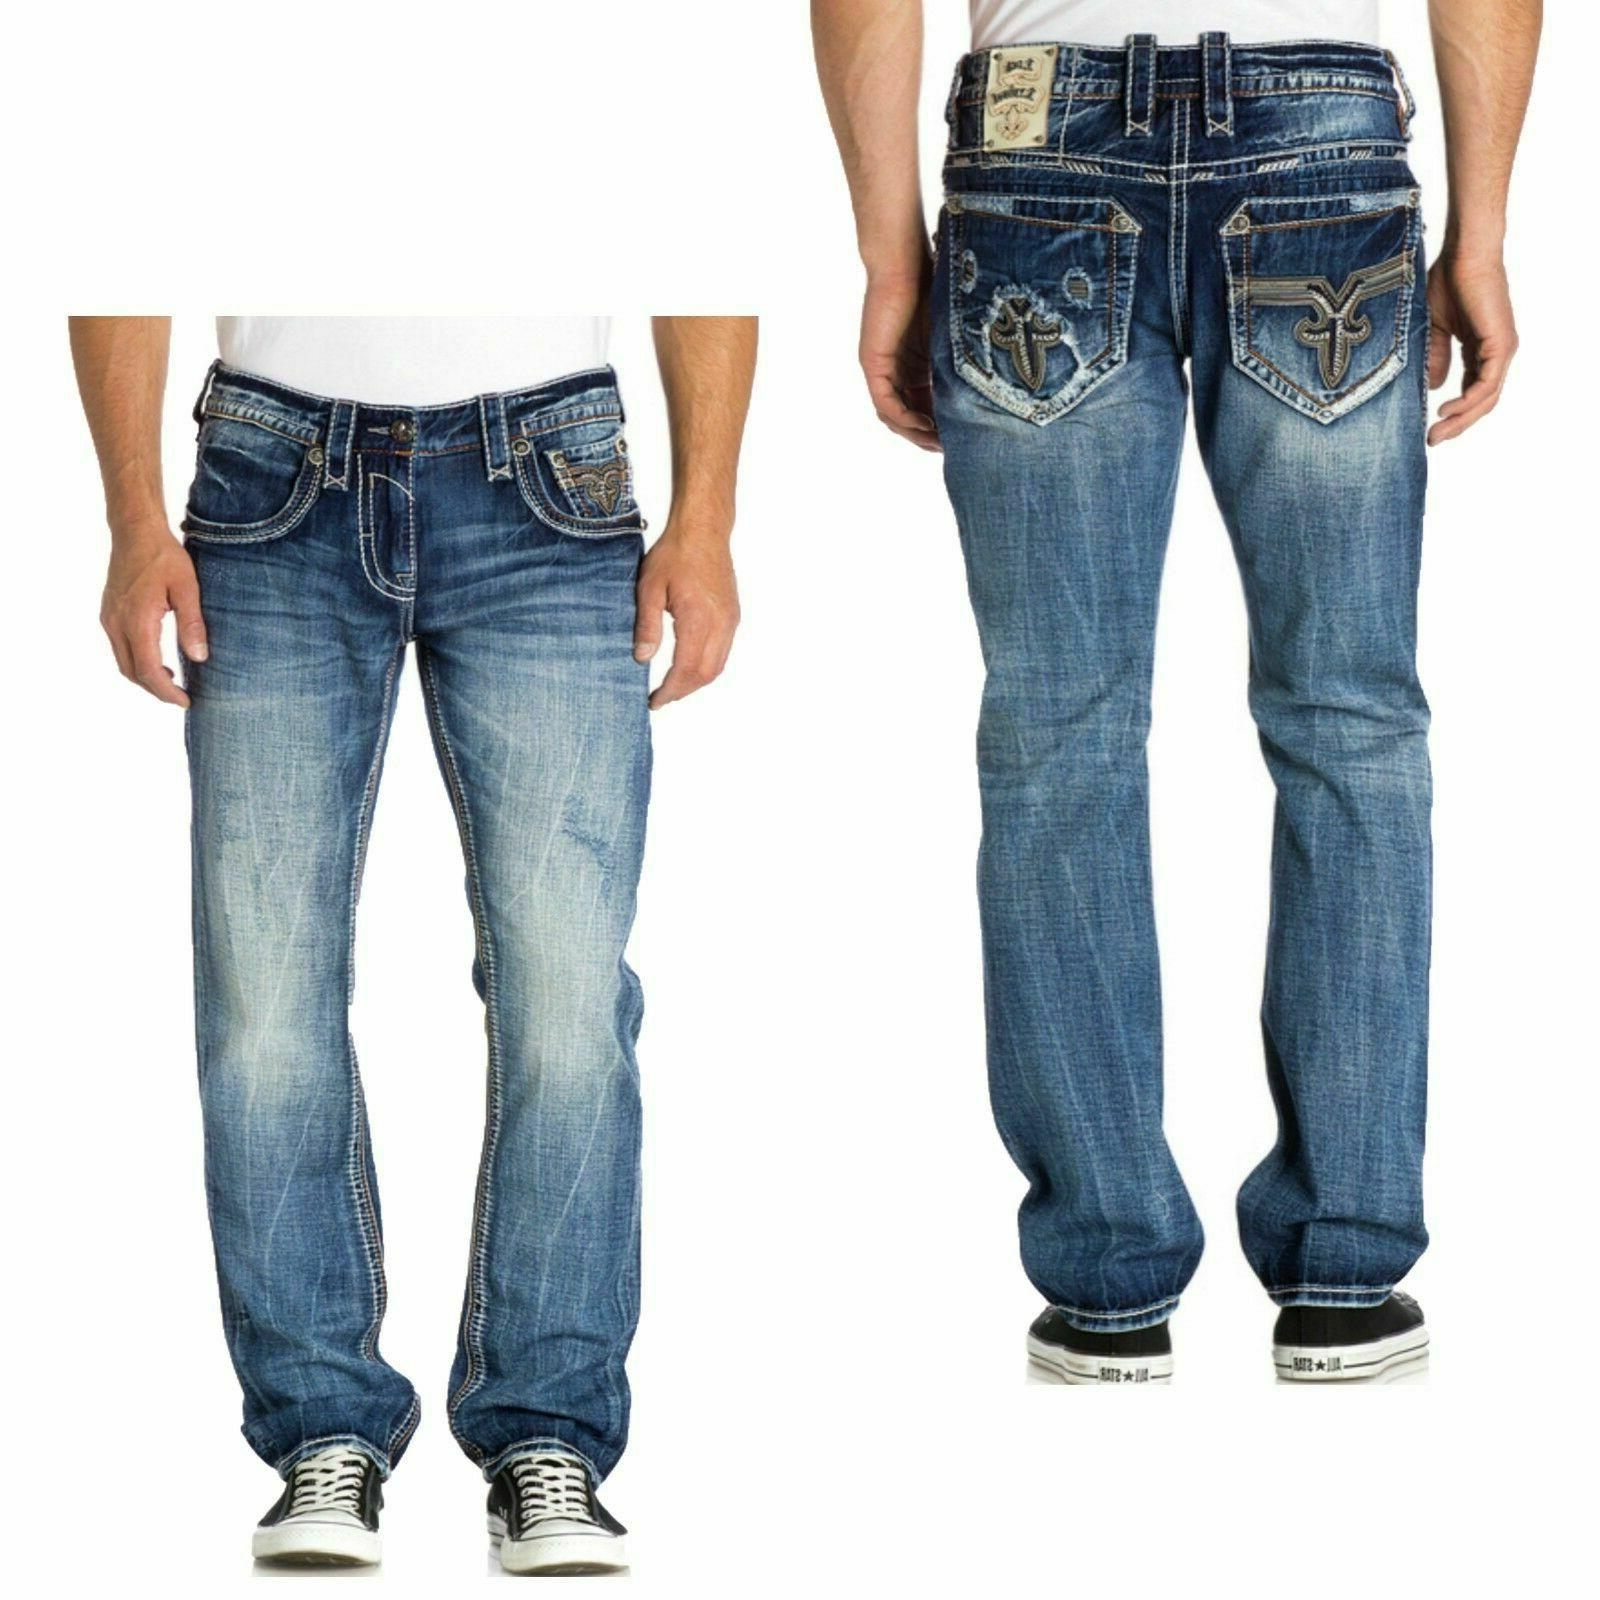 New Vietia Jeans SZ 29 32 36 40 44